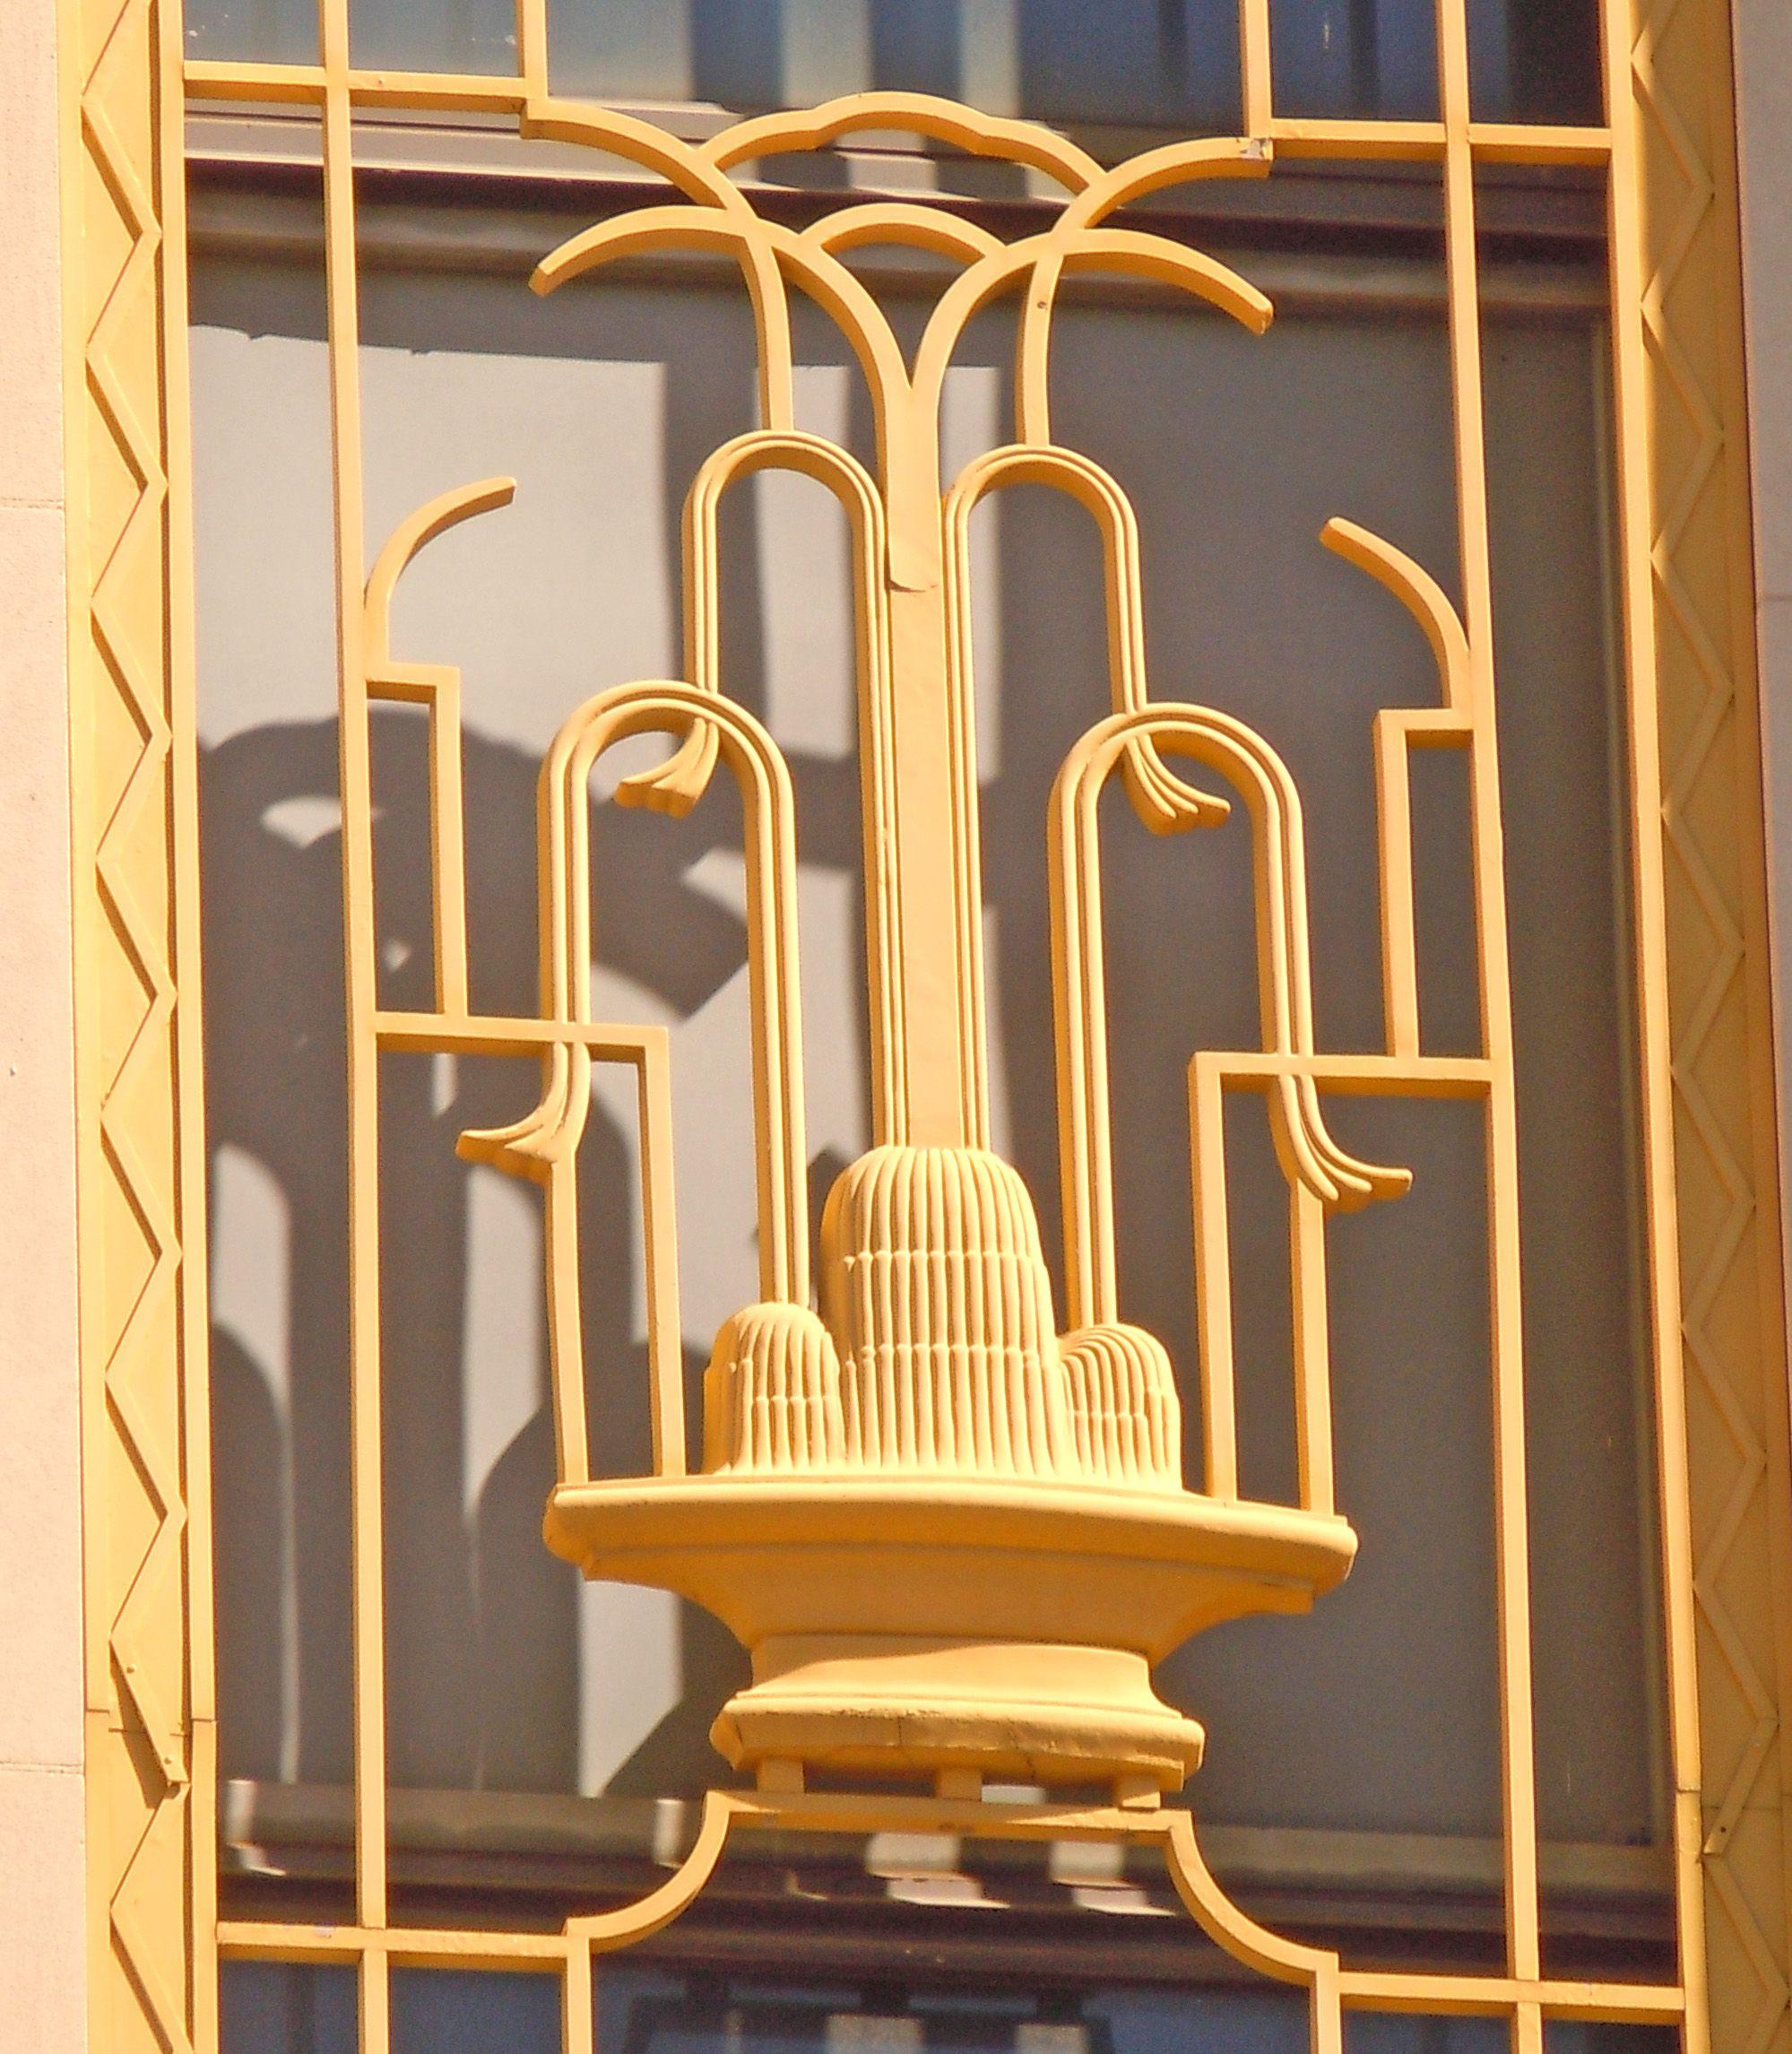 Terrace Court Apartments Birmingham Al: Window Ornamentation On The Old Loveman's Building (1935